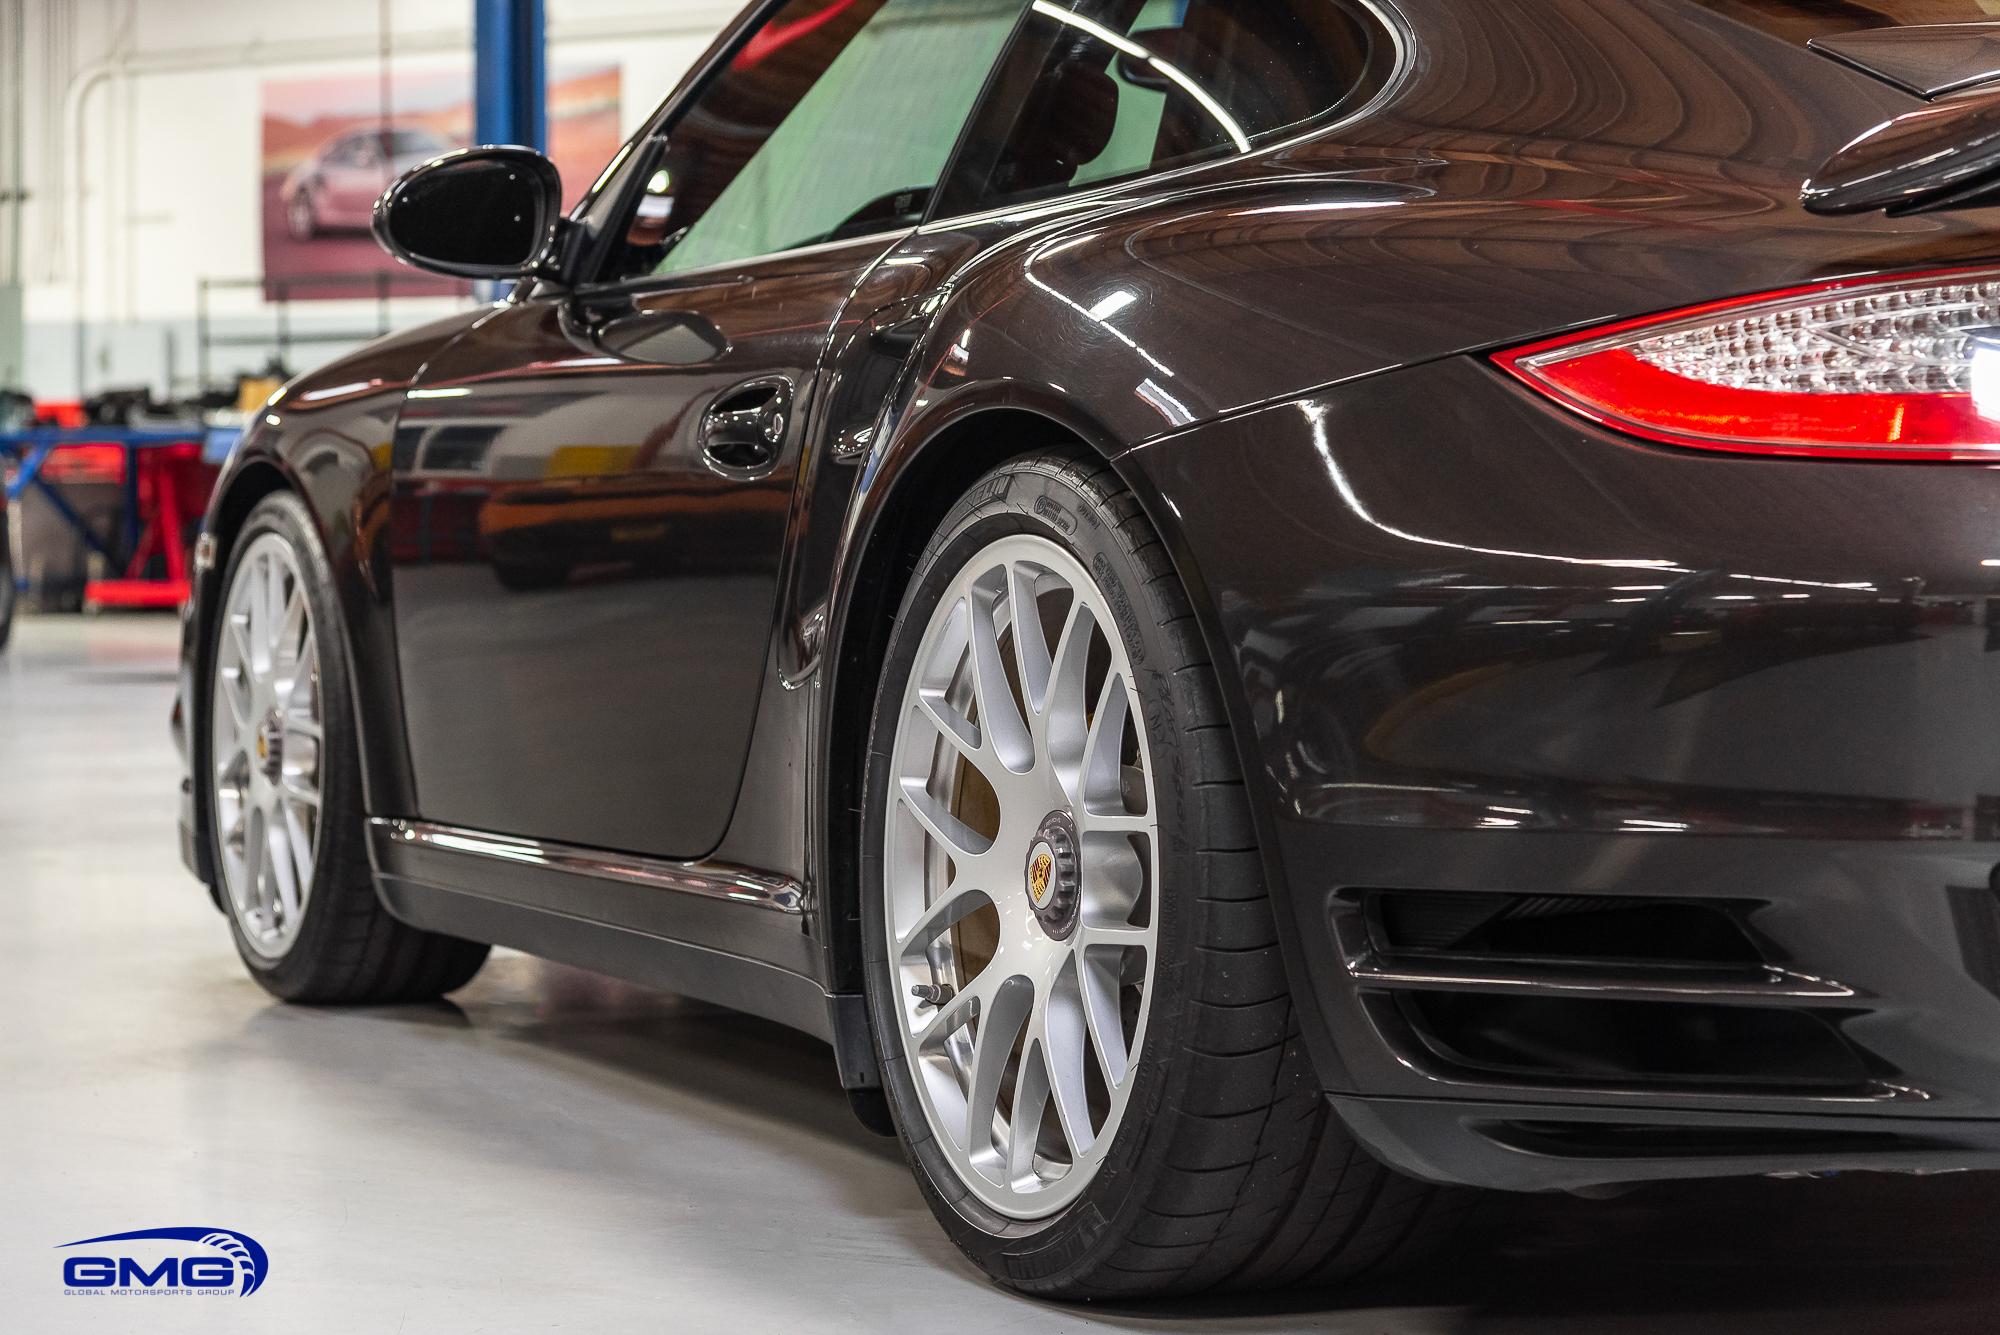 997 Porsche Turbo S